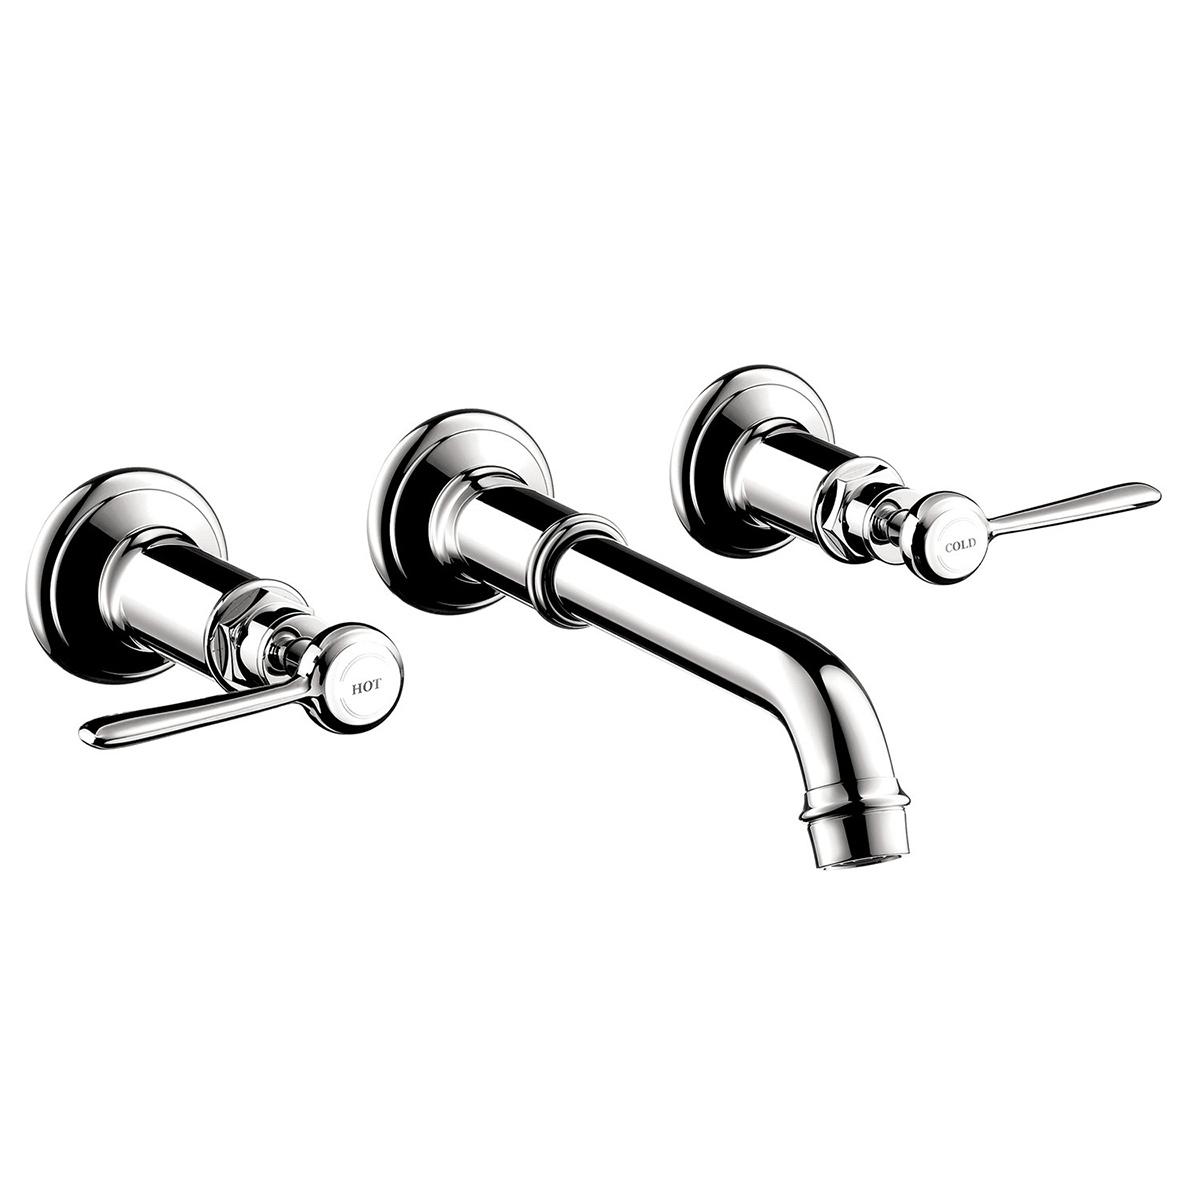 Bath4All - Hansgrohe 16534001 Chrome Axor Montreux Bathroom Faucet ...